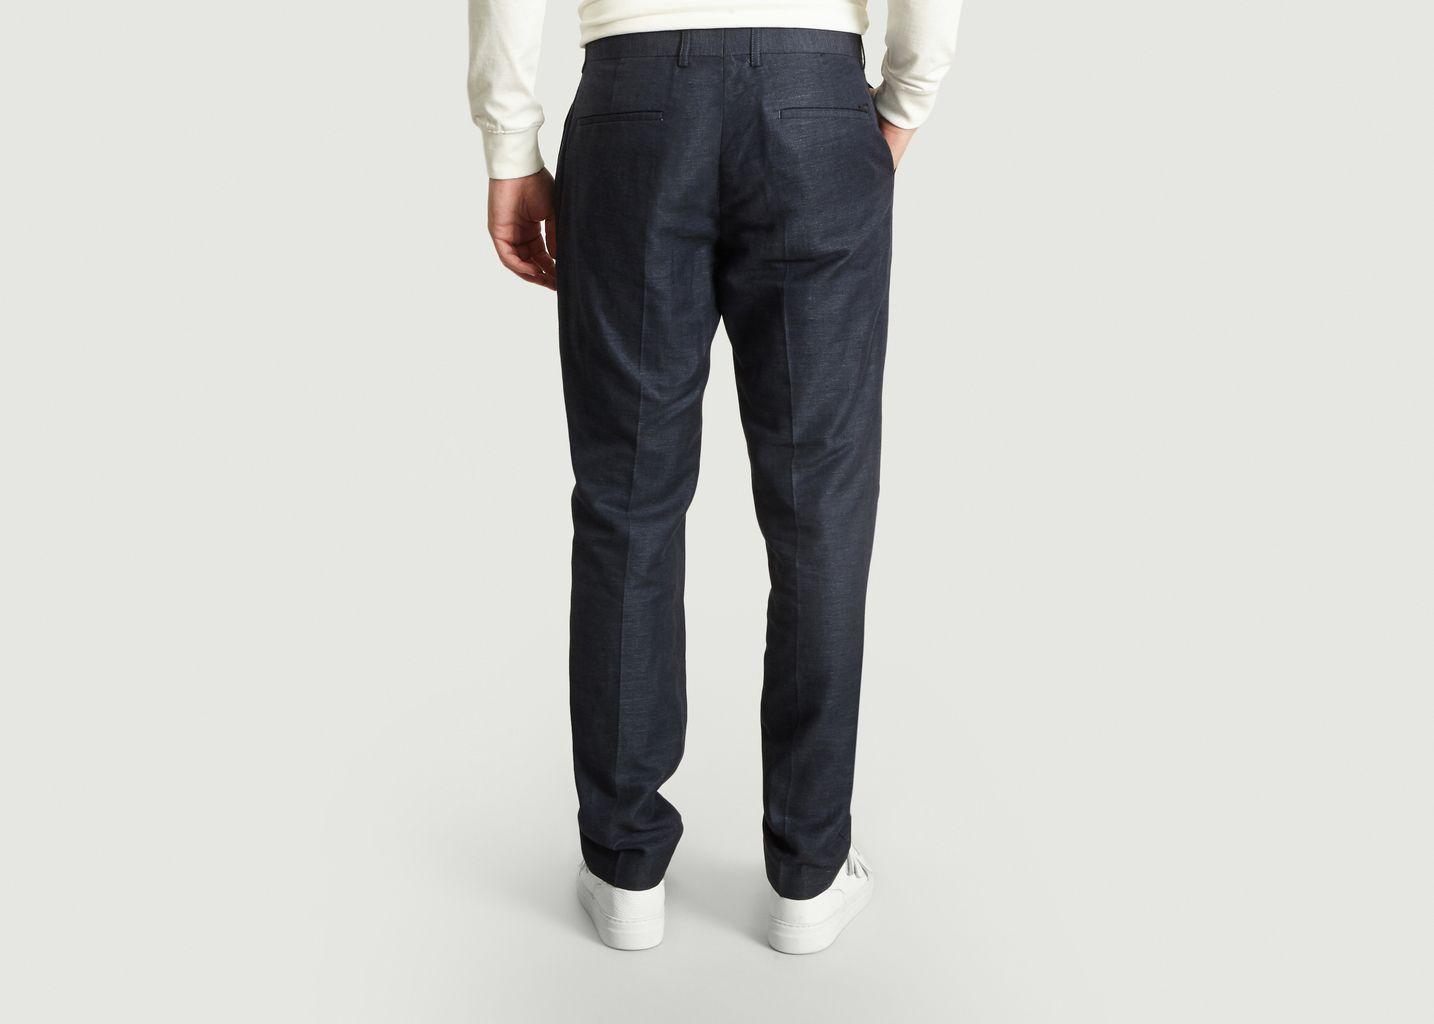 Pantalon Frank Edgar - SUIT